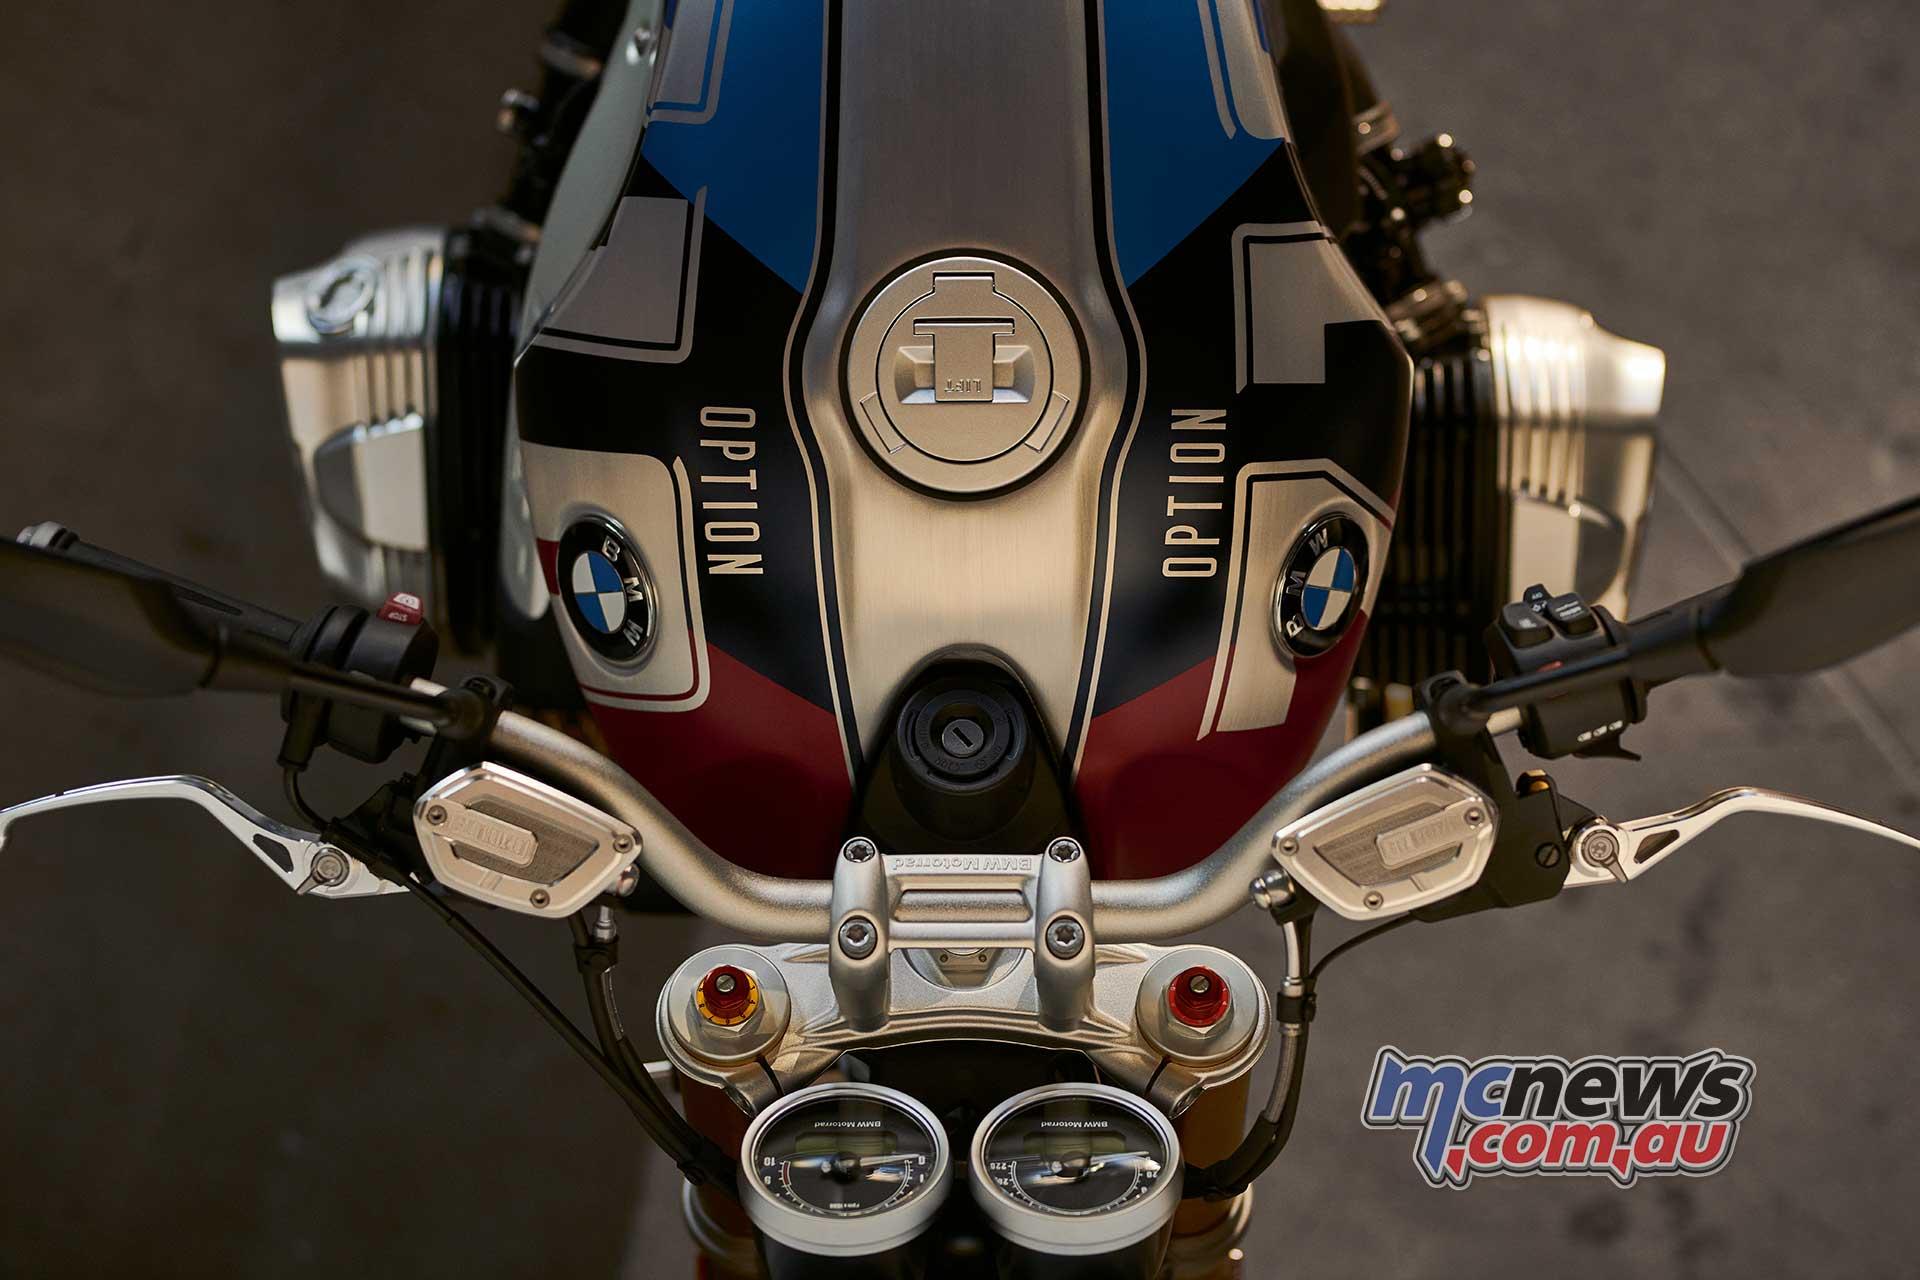 2019 BMW R nineT model line-up and changes | MCNews com au